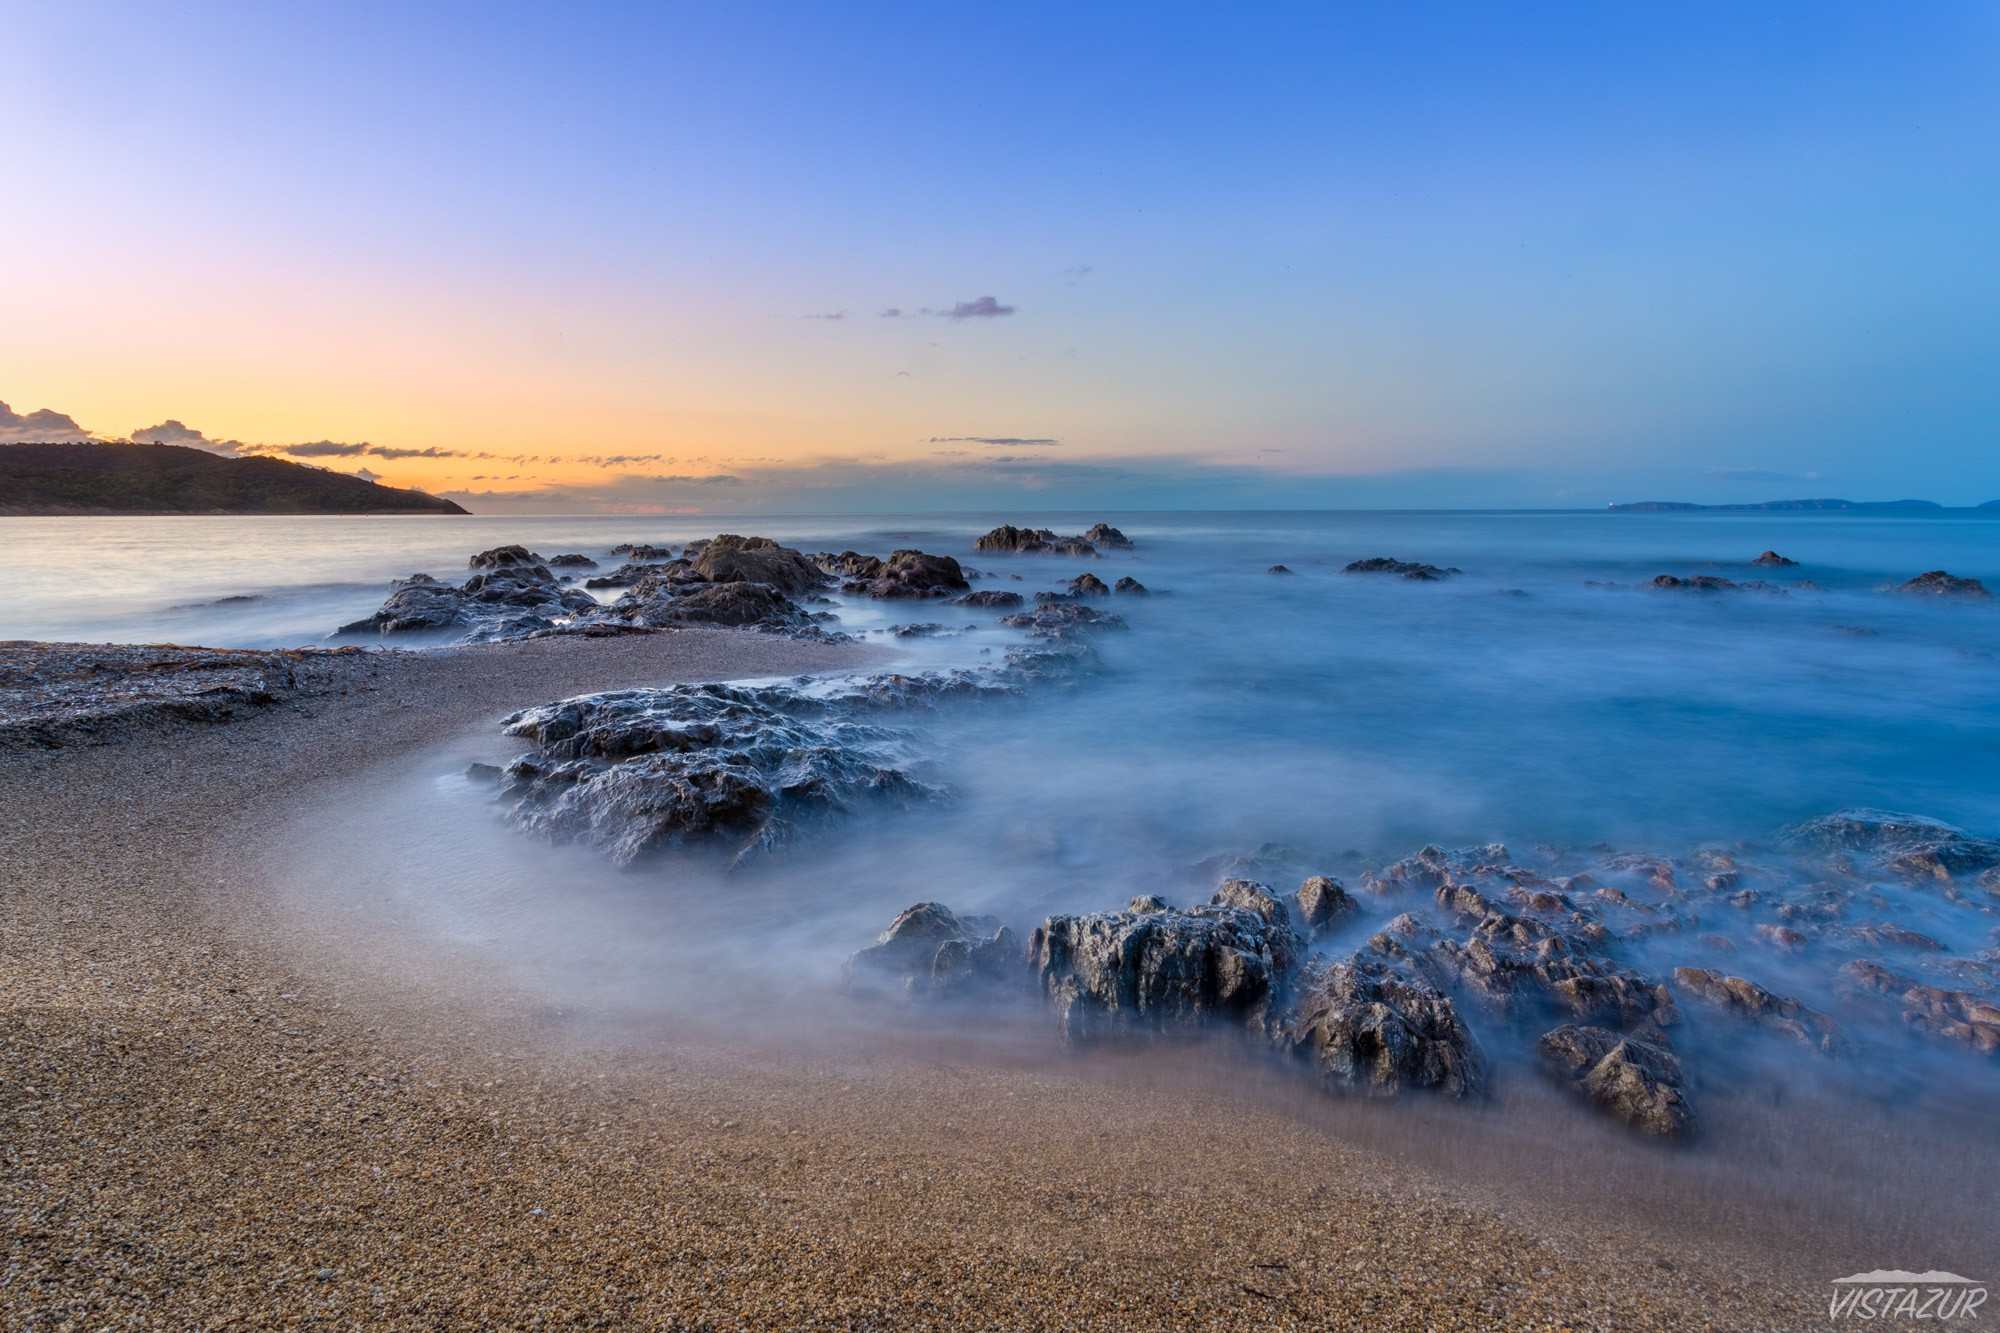 Sunset on golden islands near Vistazur villa